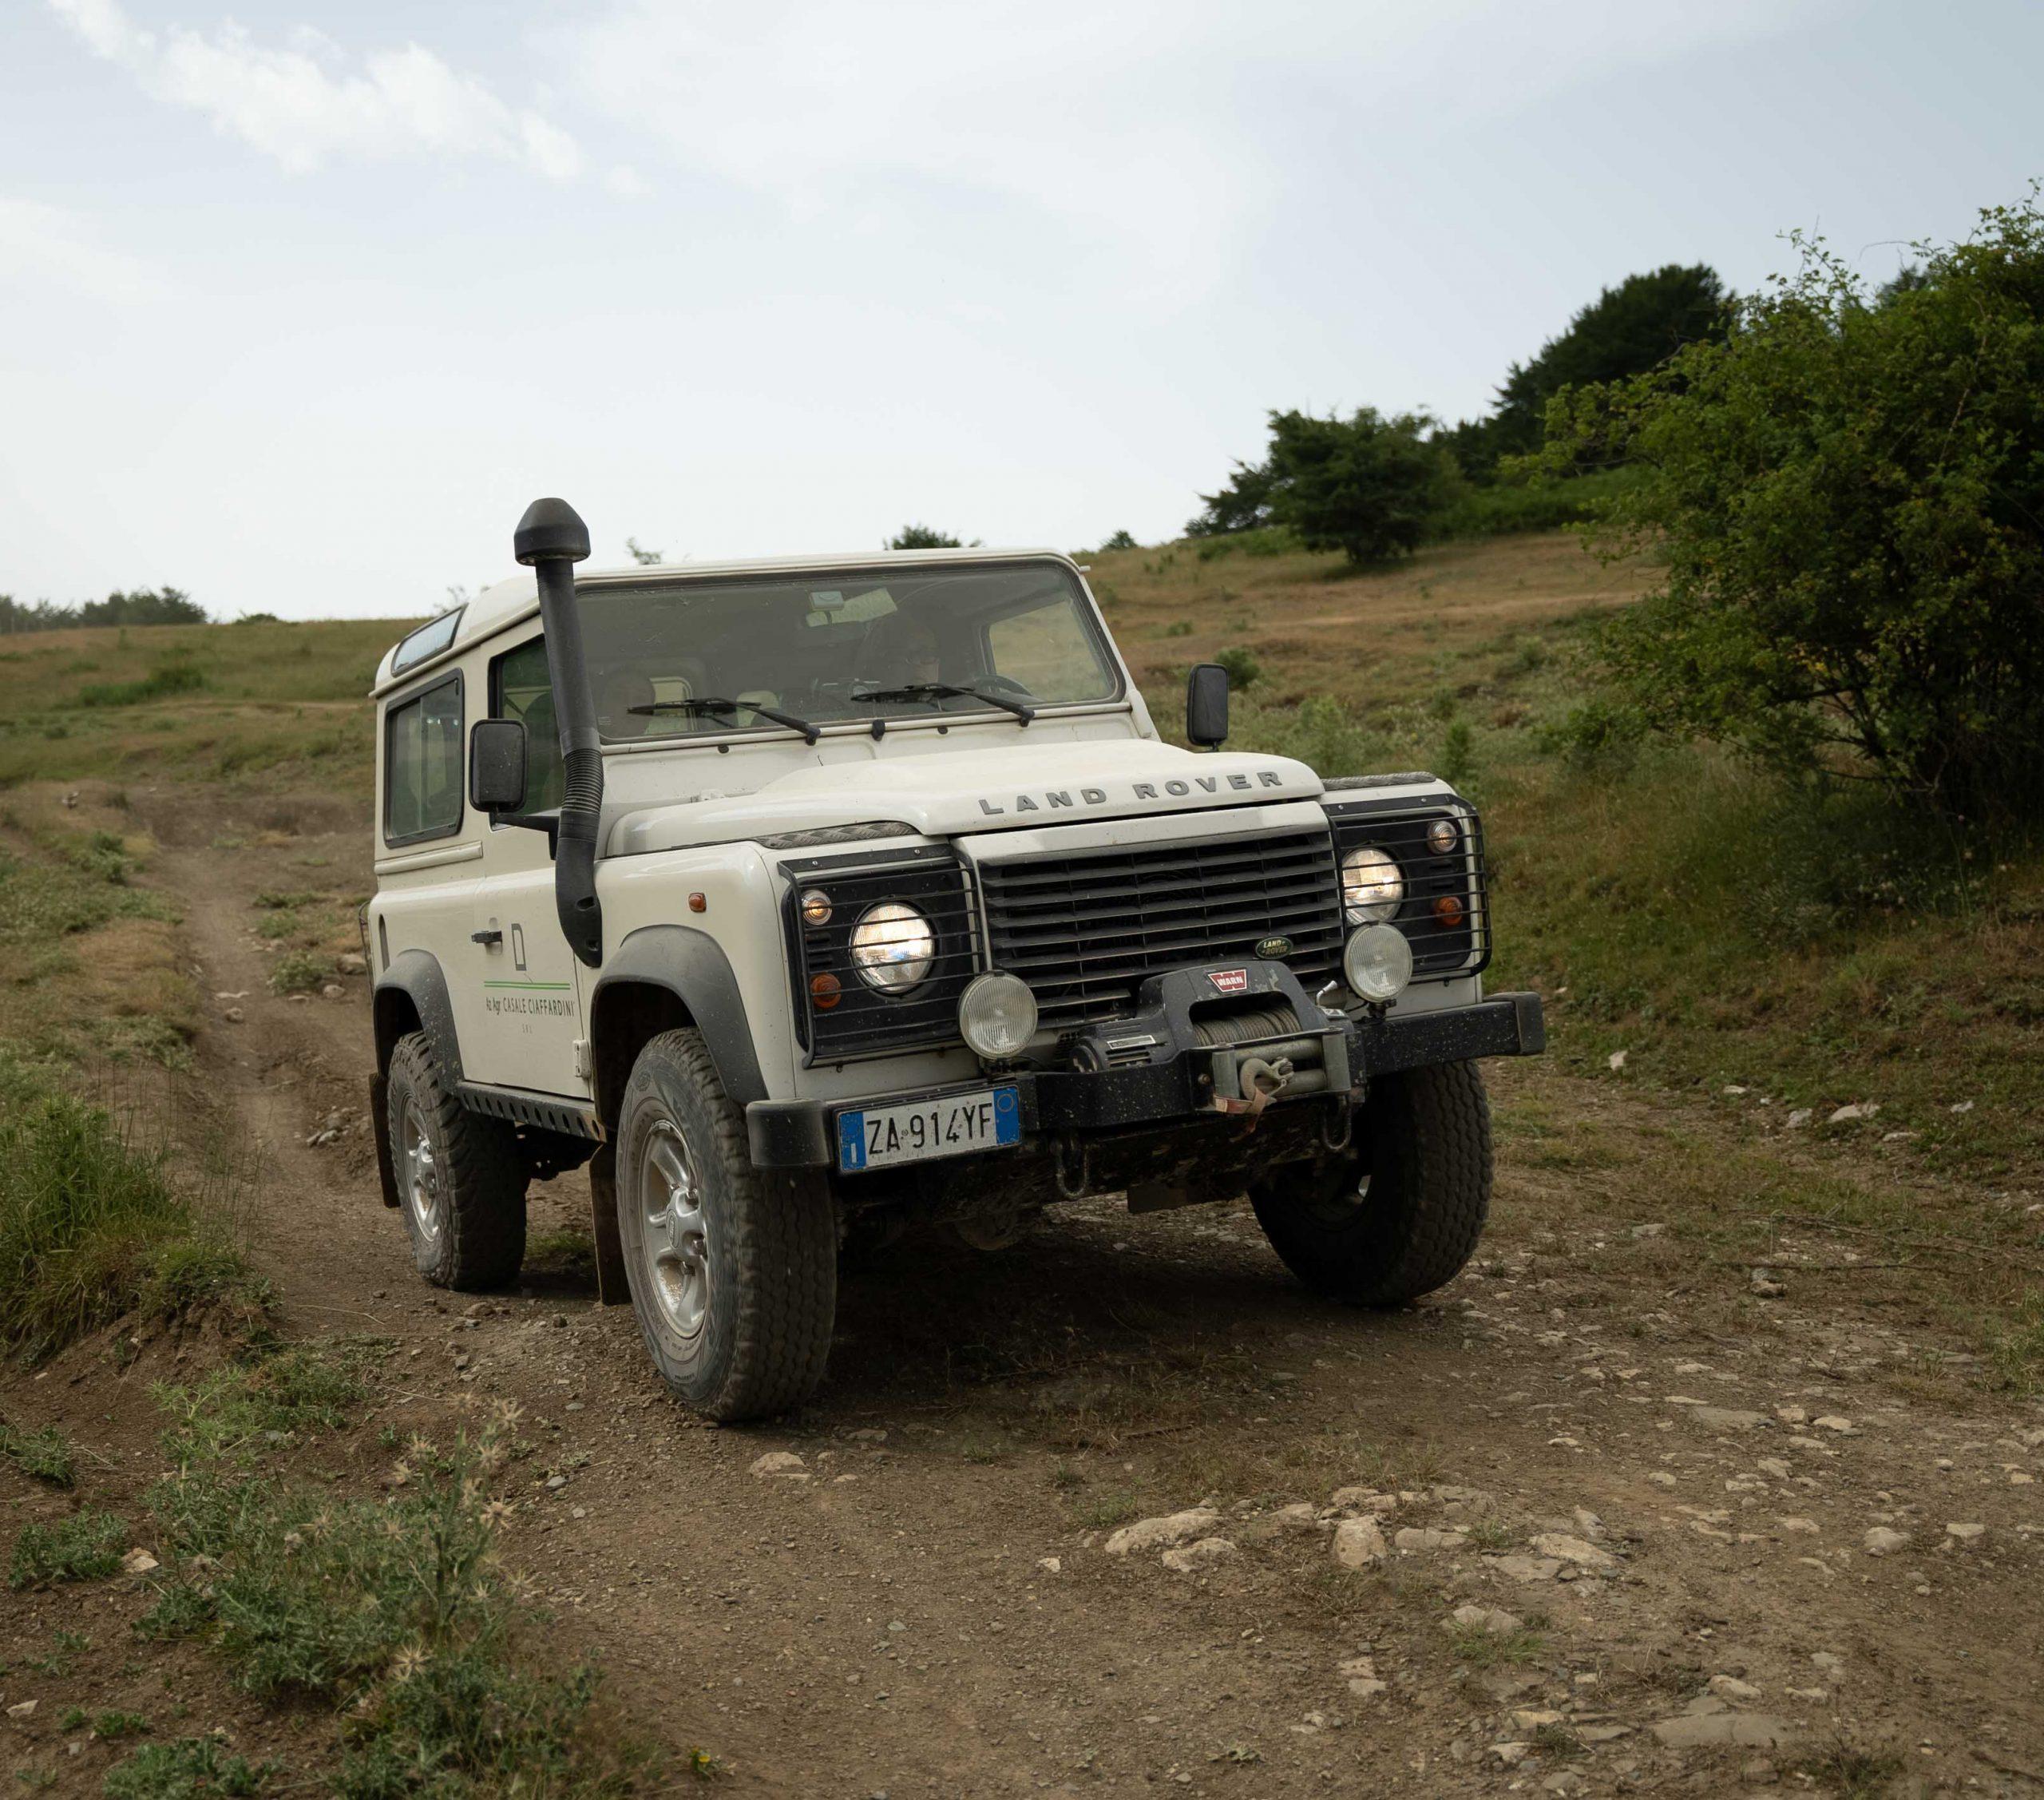 Land_Rover_Tour_Sicilia_2021_Land_Rover_Experience_Italia_-72